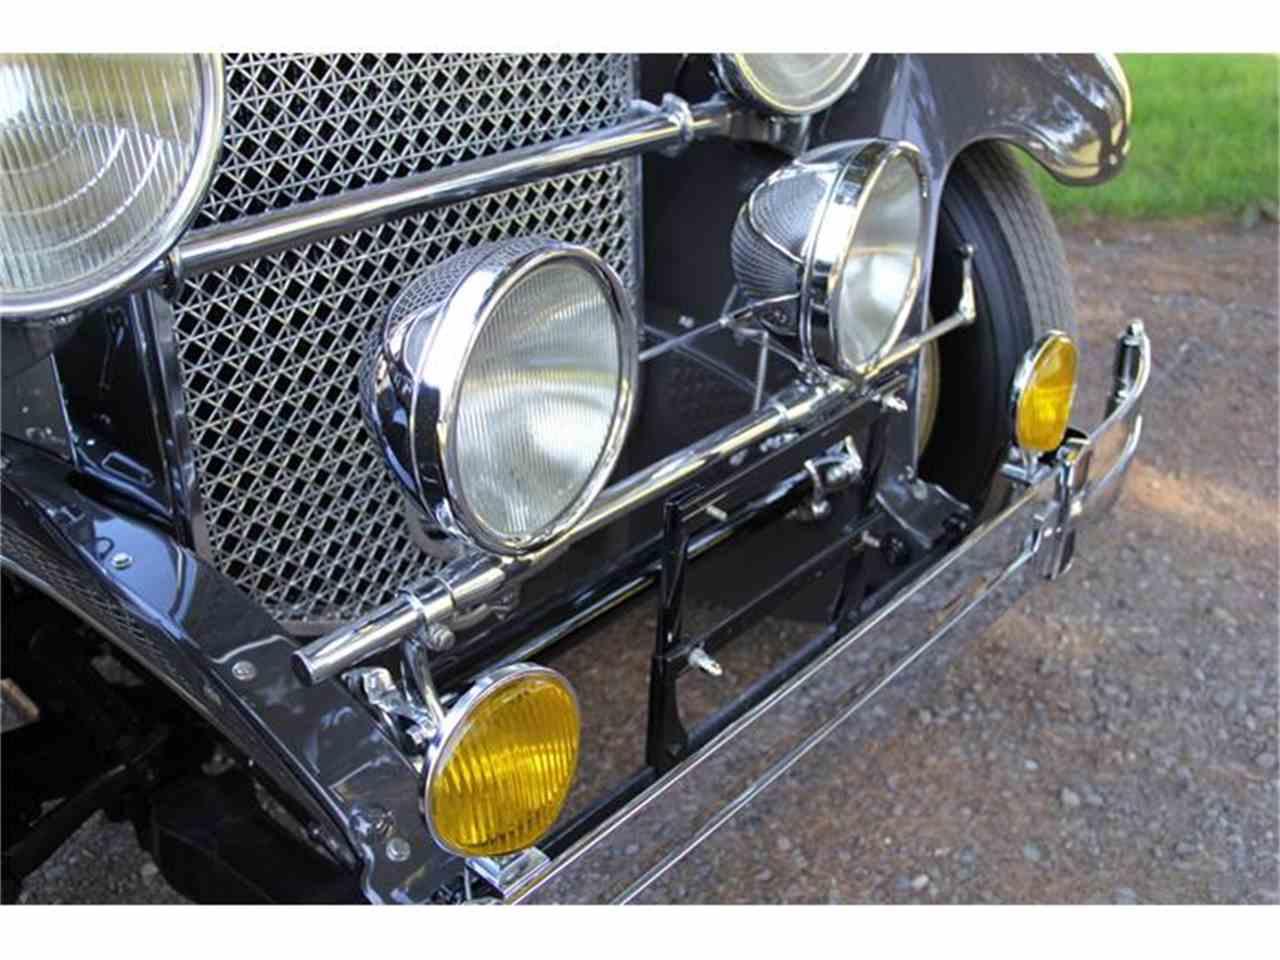 1929 Packard Touring Car For Sale: 1929 Packard Phaeton For Sale